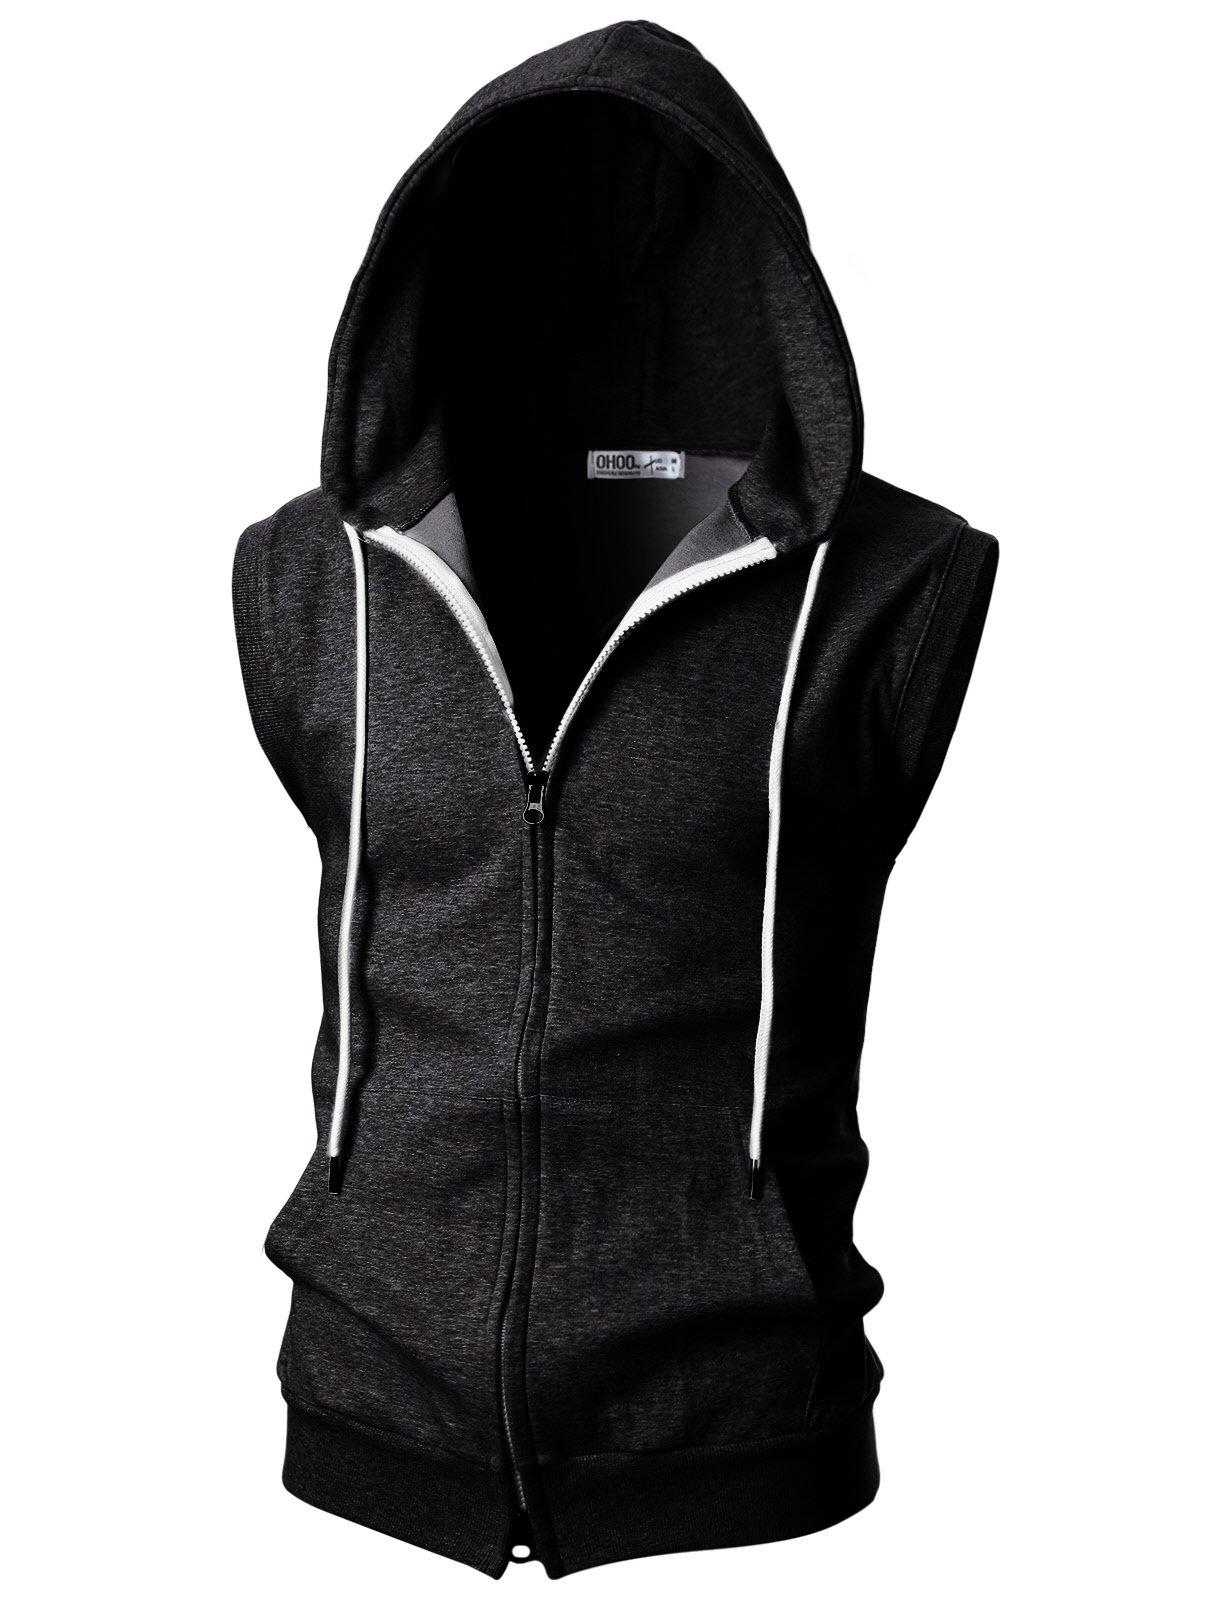 Ohoo Mens Slim Fit Sleeveless Lightweight Zip-up Hooded Vest with Double Slide Zipper/DCF011-CHARCOAL-XXXL